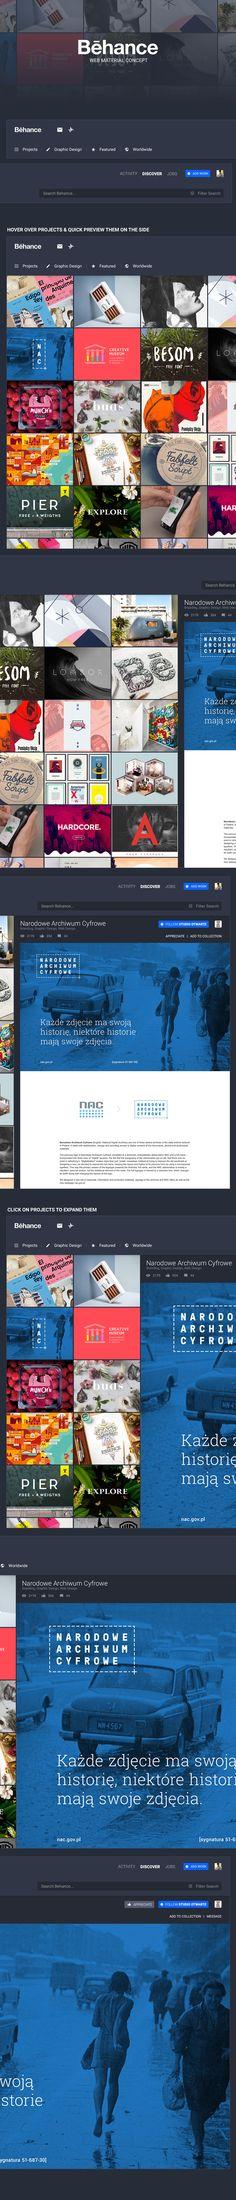 Behance Web Material Concept on Behance